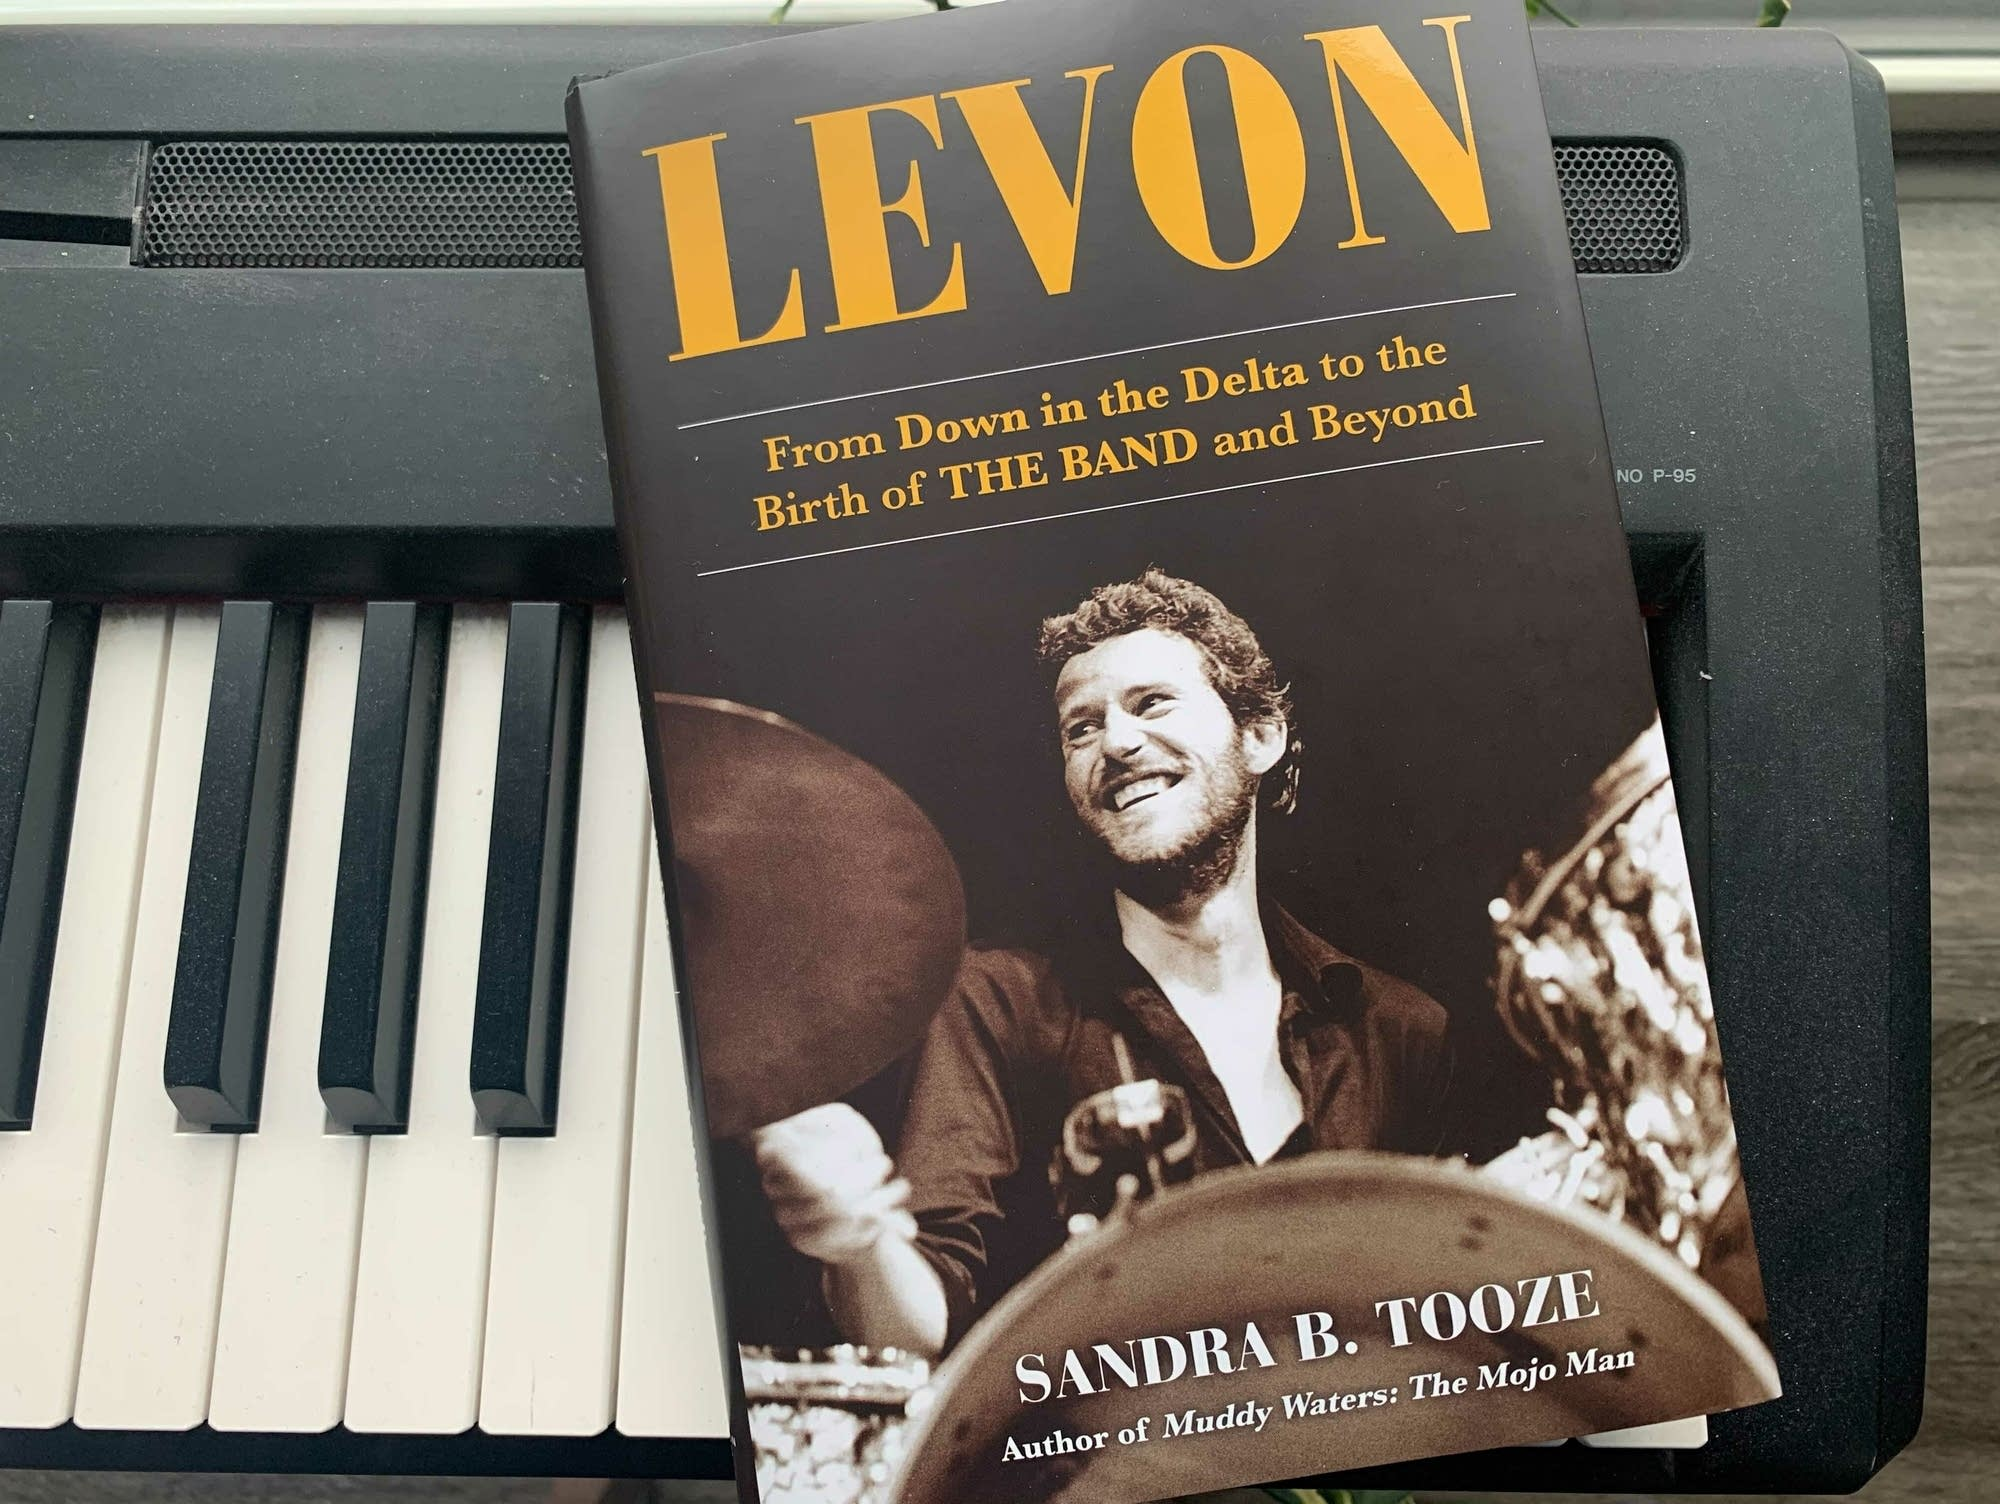 Levon Helm biography resting on keyboard.